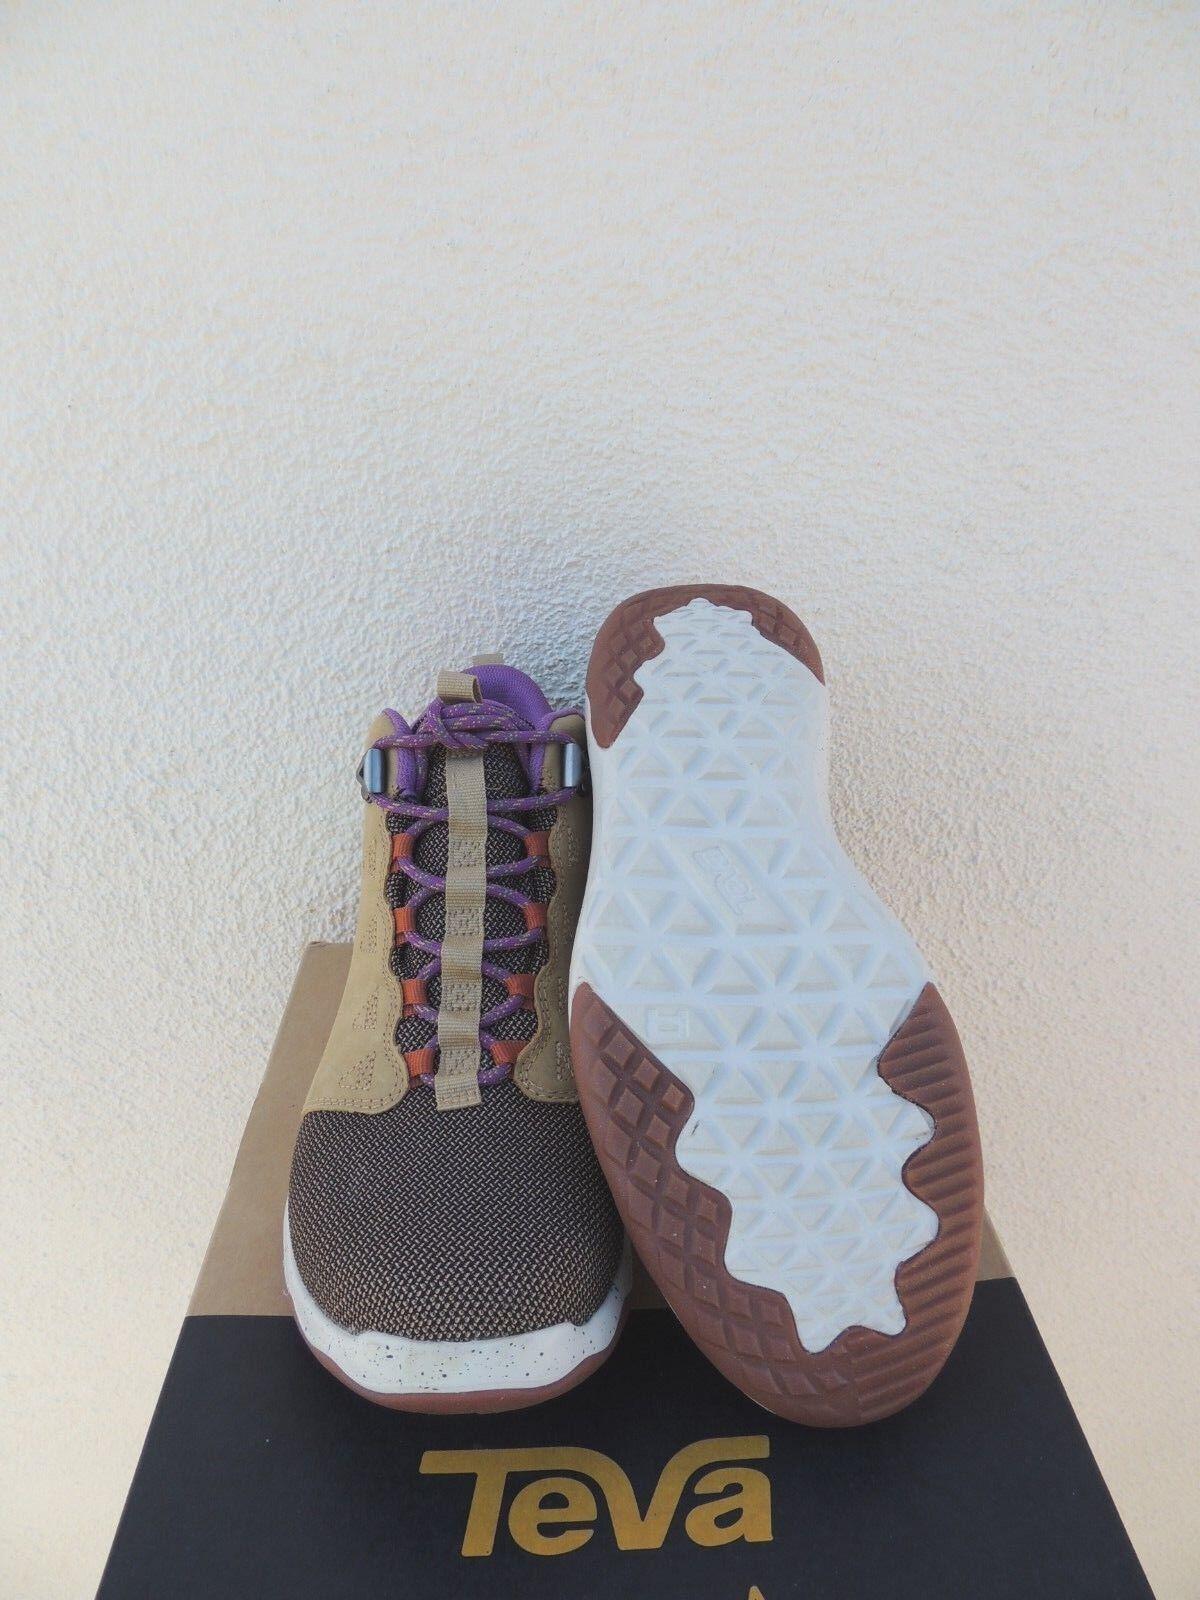 TEVA PRAIRIE SAND ARROWOOD MID WP 7/ LEATHER SNEAKER Stiefel, US 7/ WP EUR 38 NEW c2f2d5